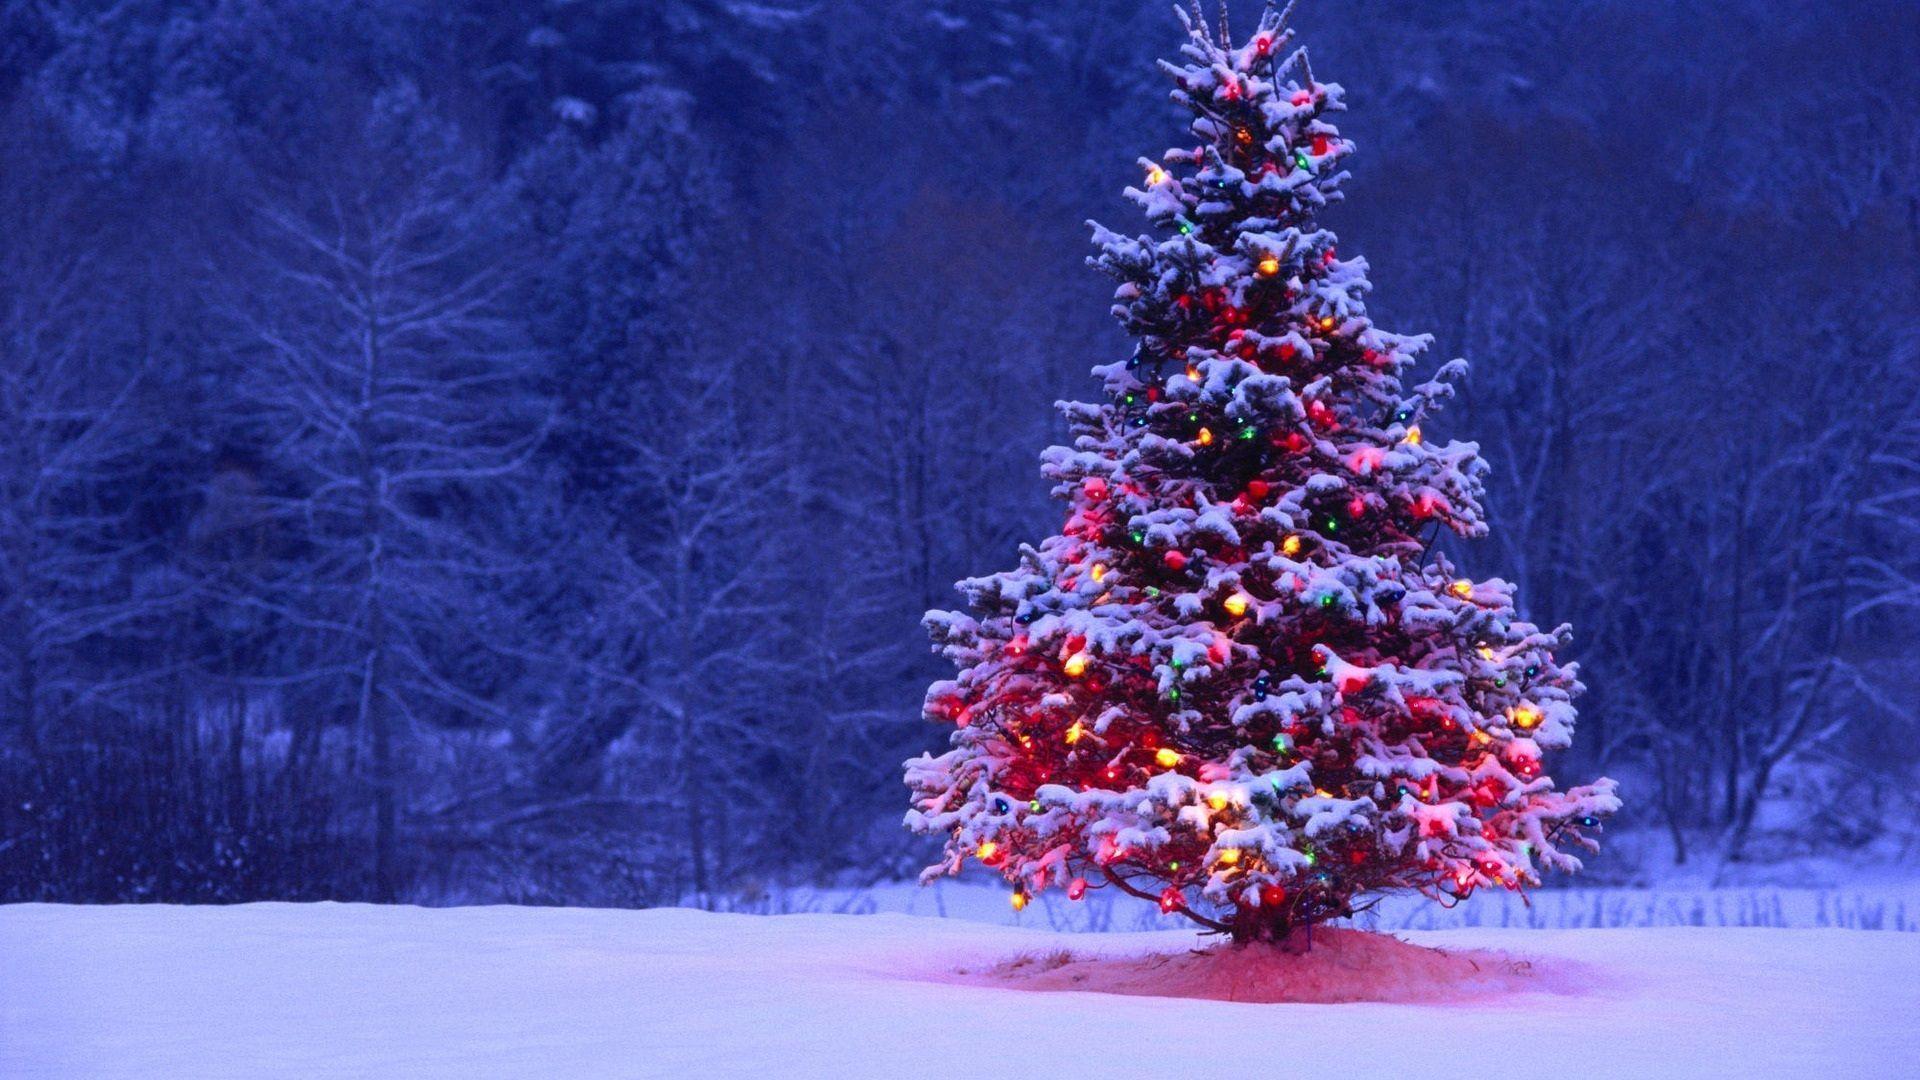 Purple Christmas Tree Wallpapers Top Free Purple Christmas Tree Backgrounds Wallpaperaccess